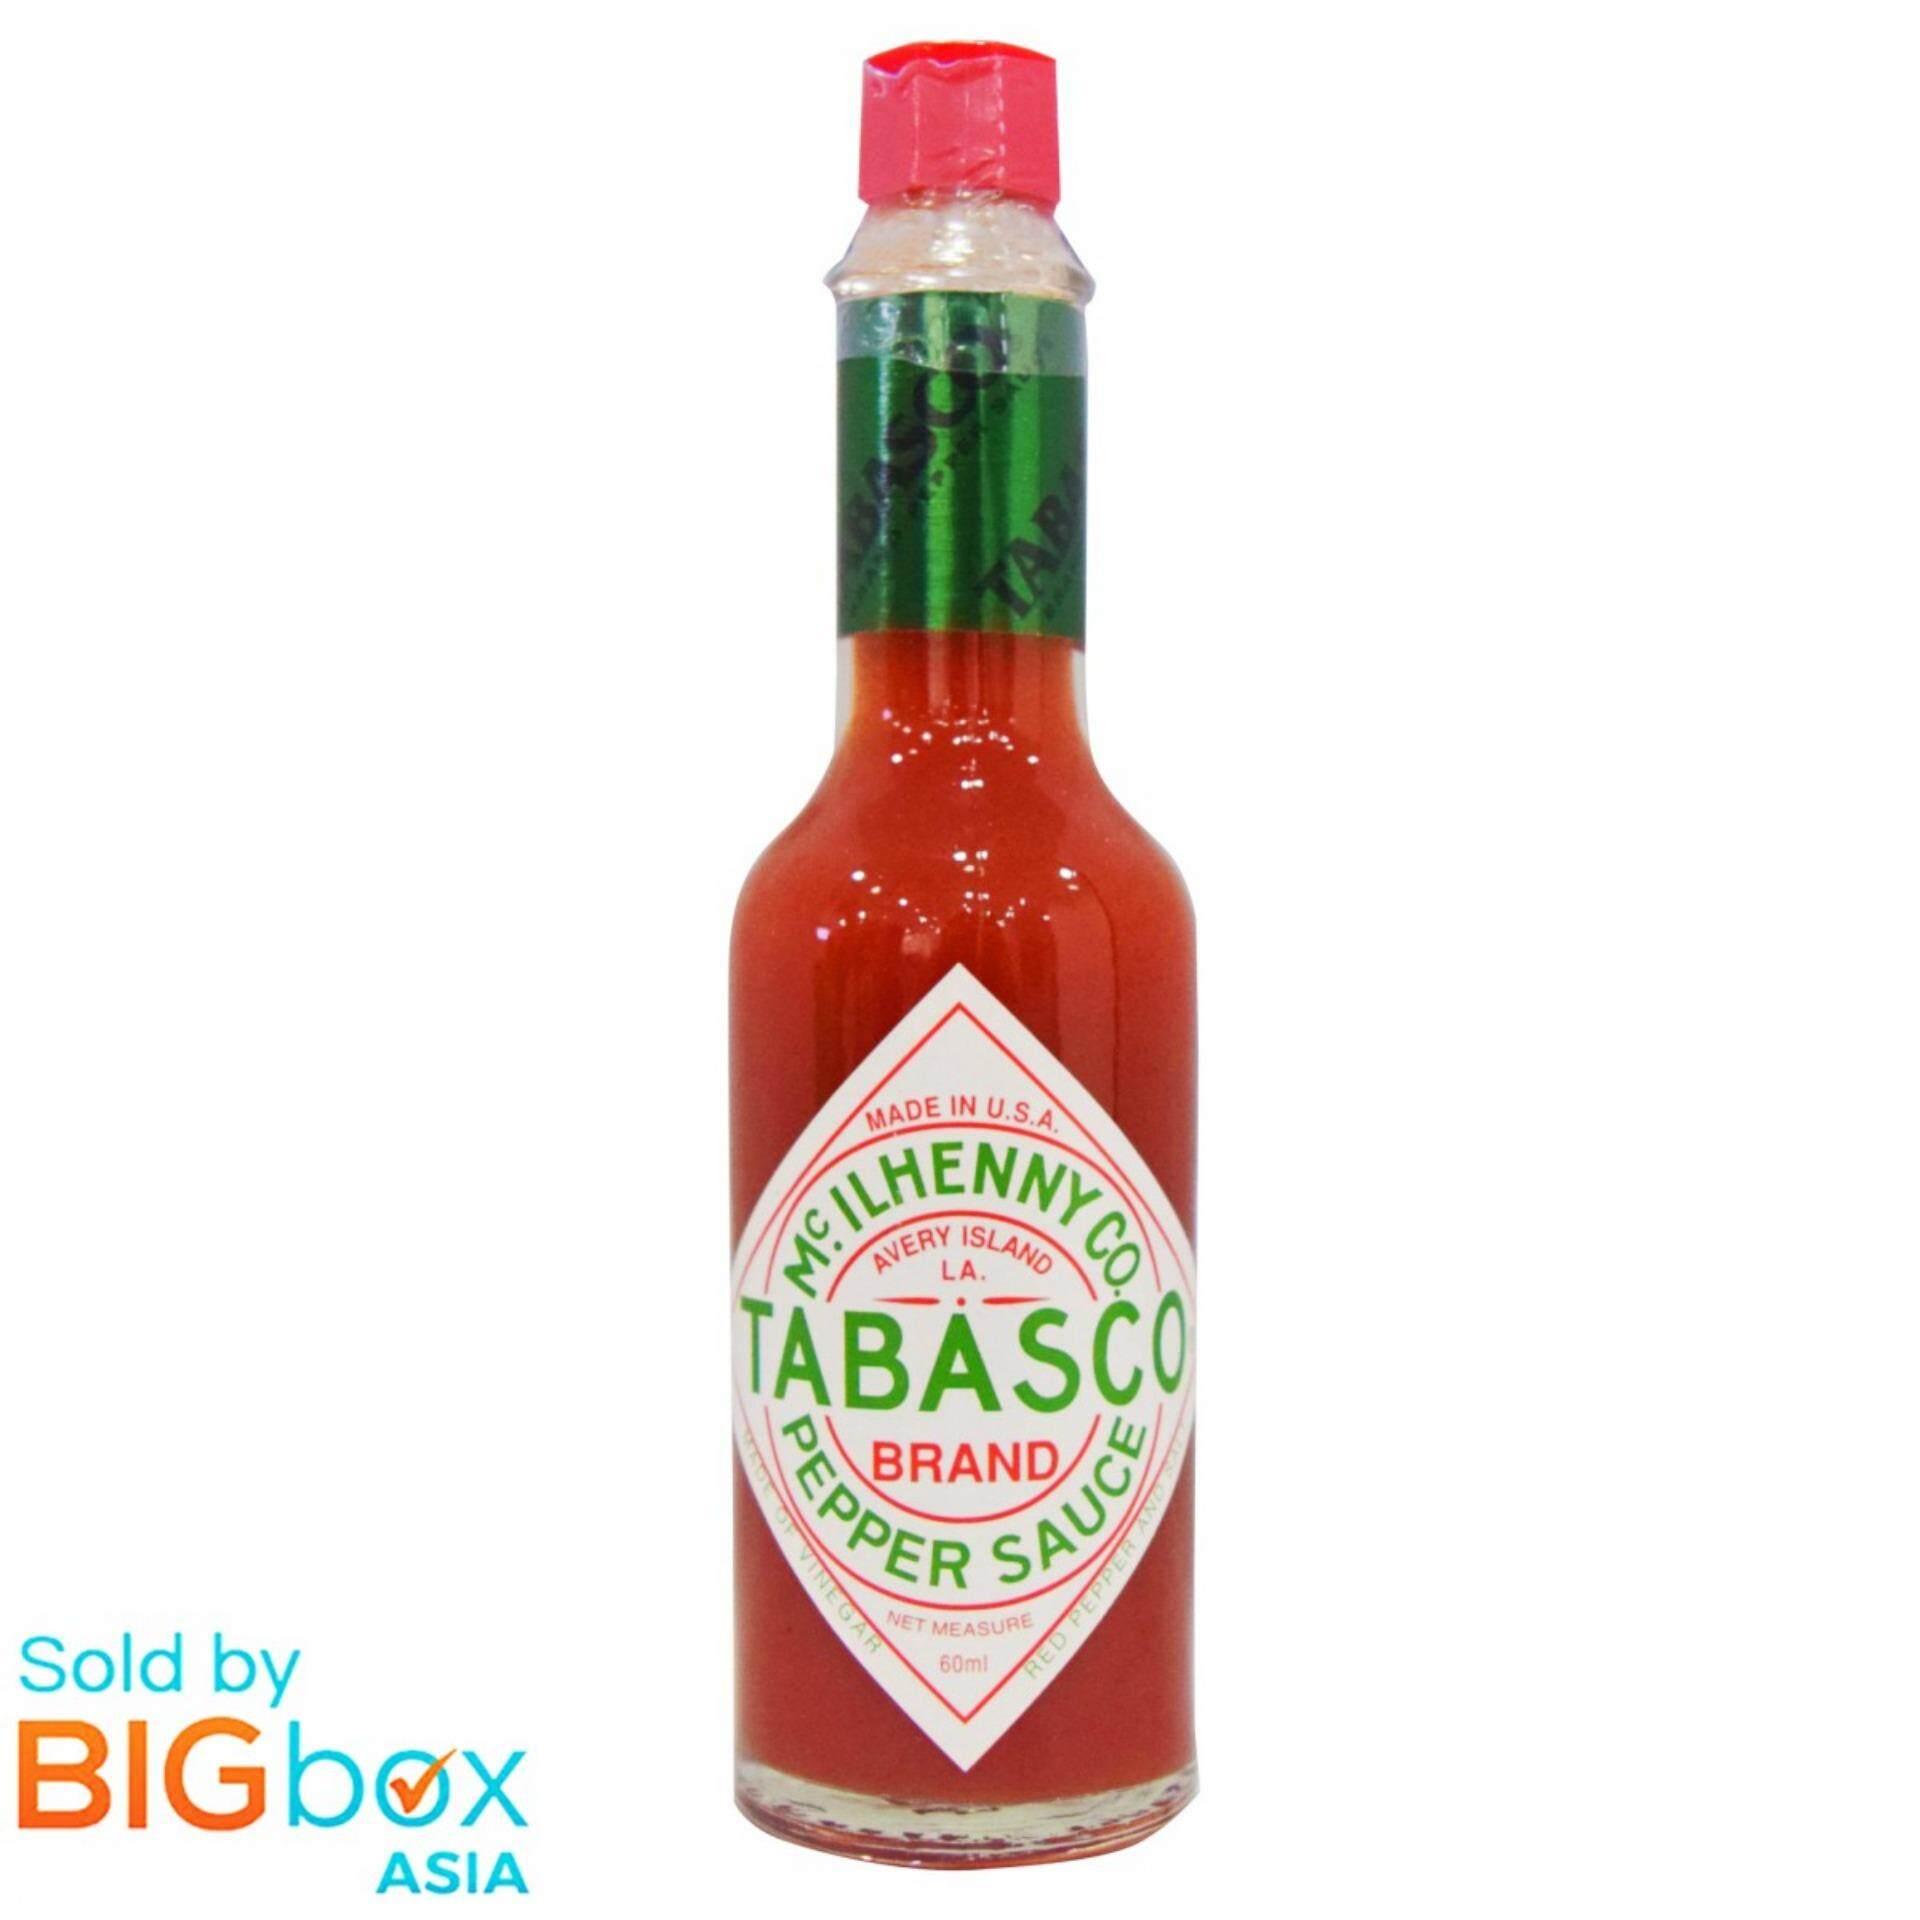 [BIGBox Asia] Tabasco Pepper Sauce 60ml - US